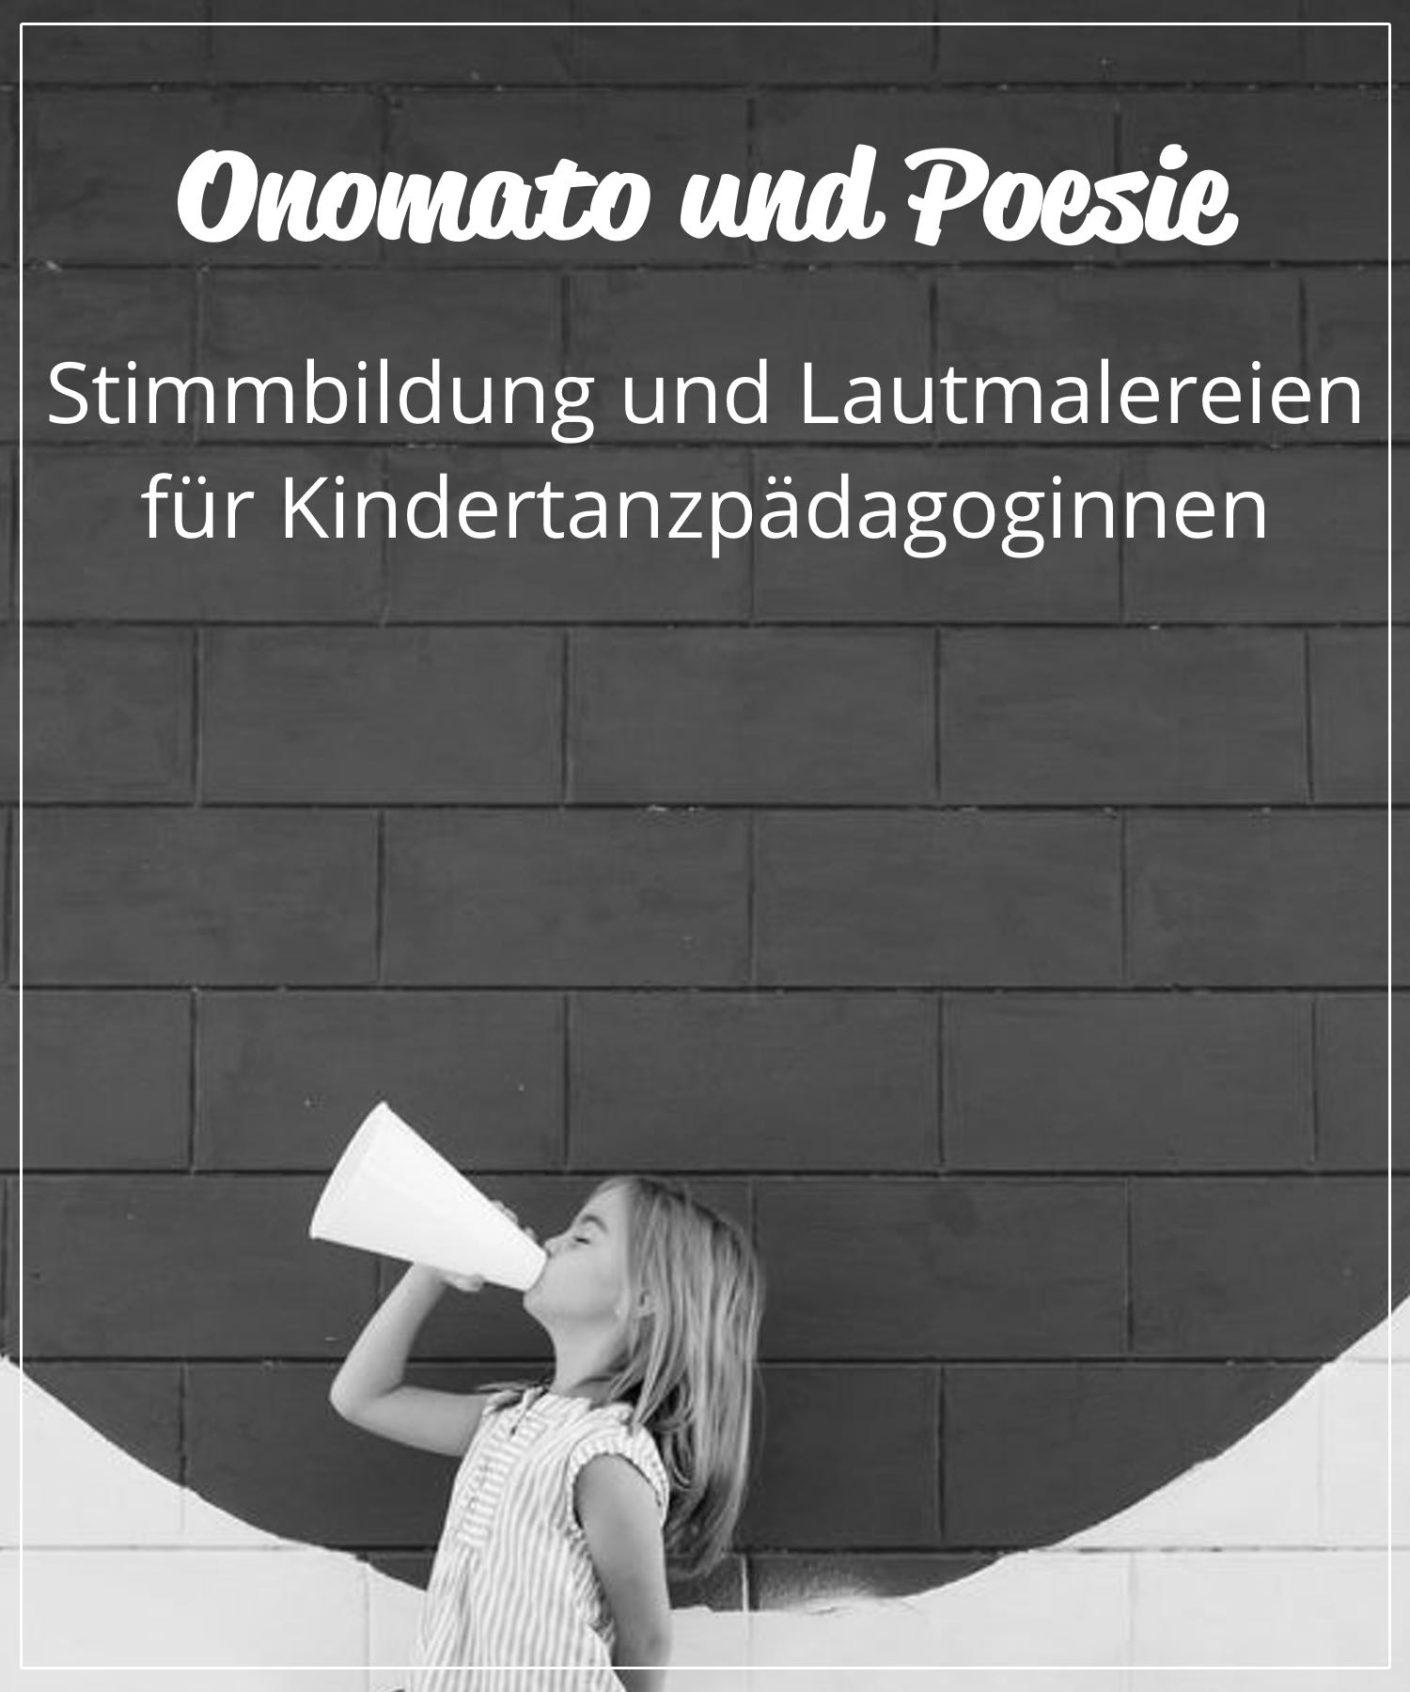 Onomatopoesie_Kindertanz_Fortbildung_Tanzpädagogik_Stimmbildung_Pädagogen